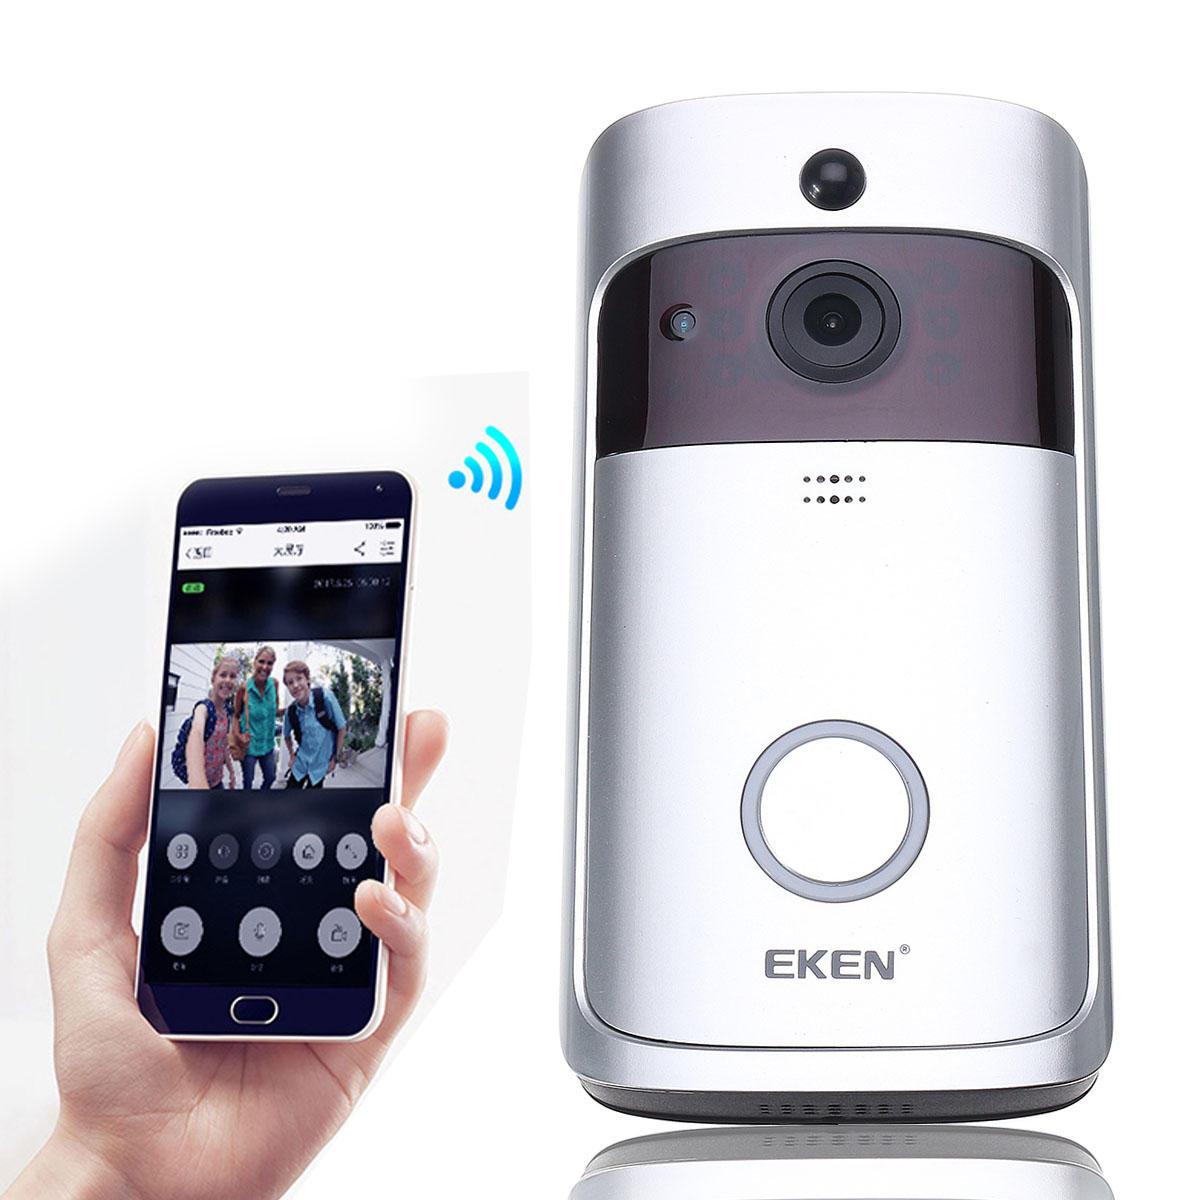 EKEN A8 Smart Wireless WiFi Video Visible Doorbell Motion Detection Wide Angle 166° 8GB Internal Storage